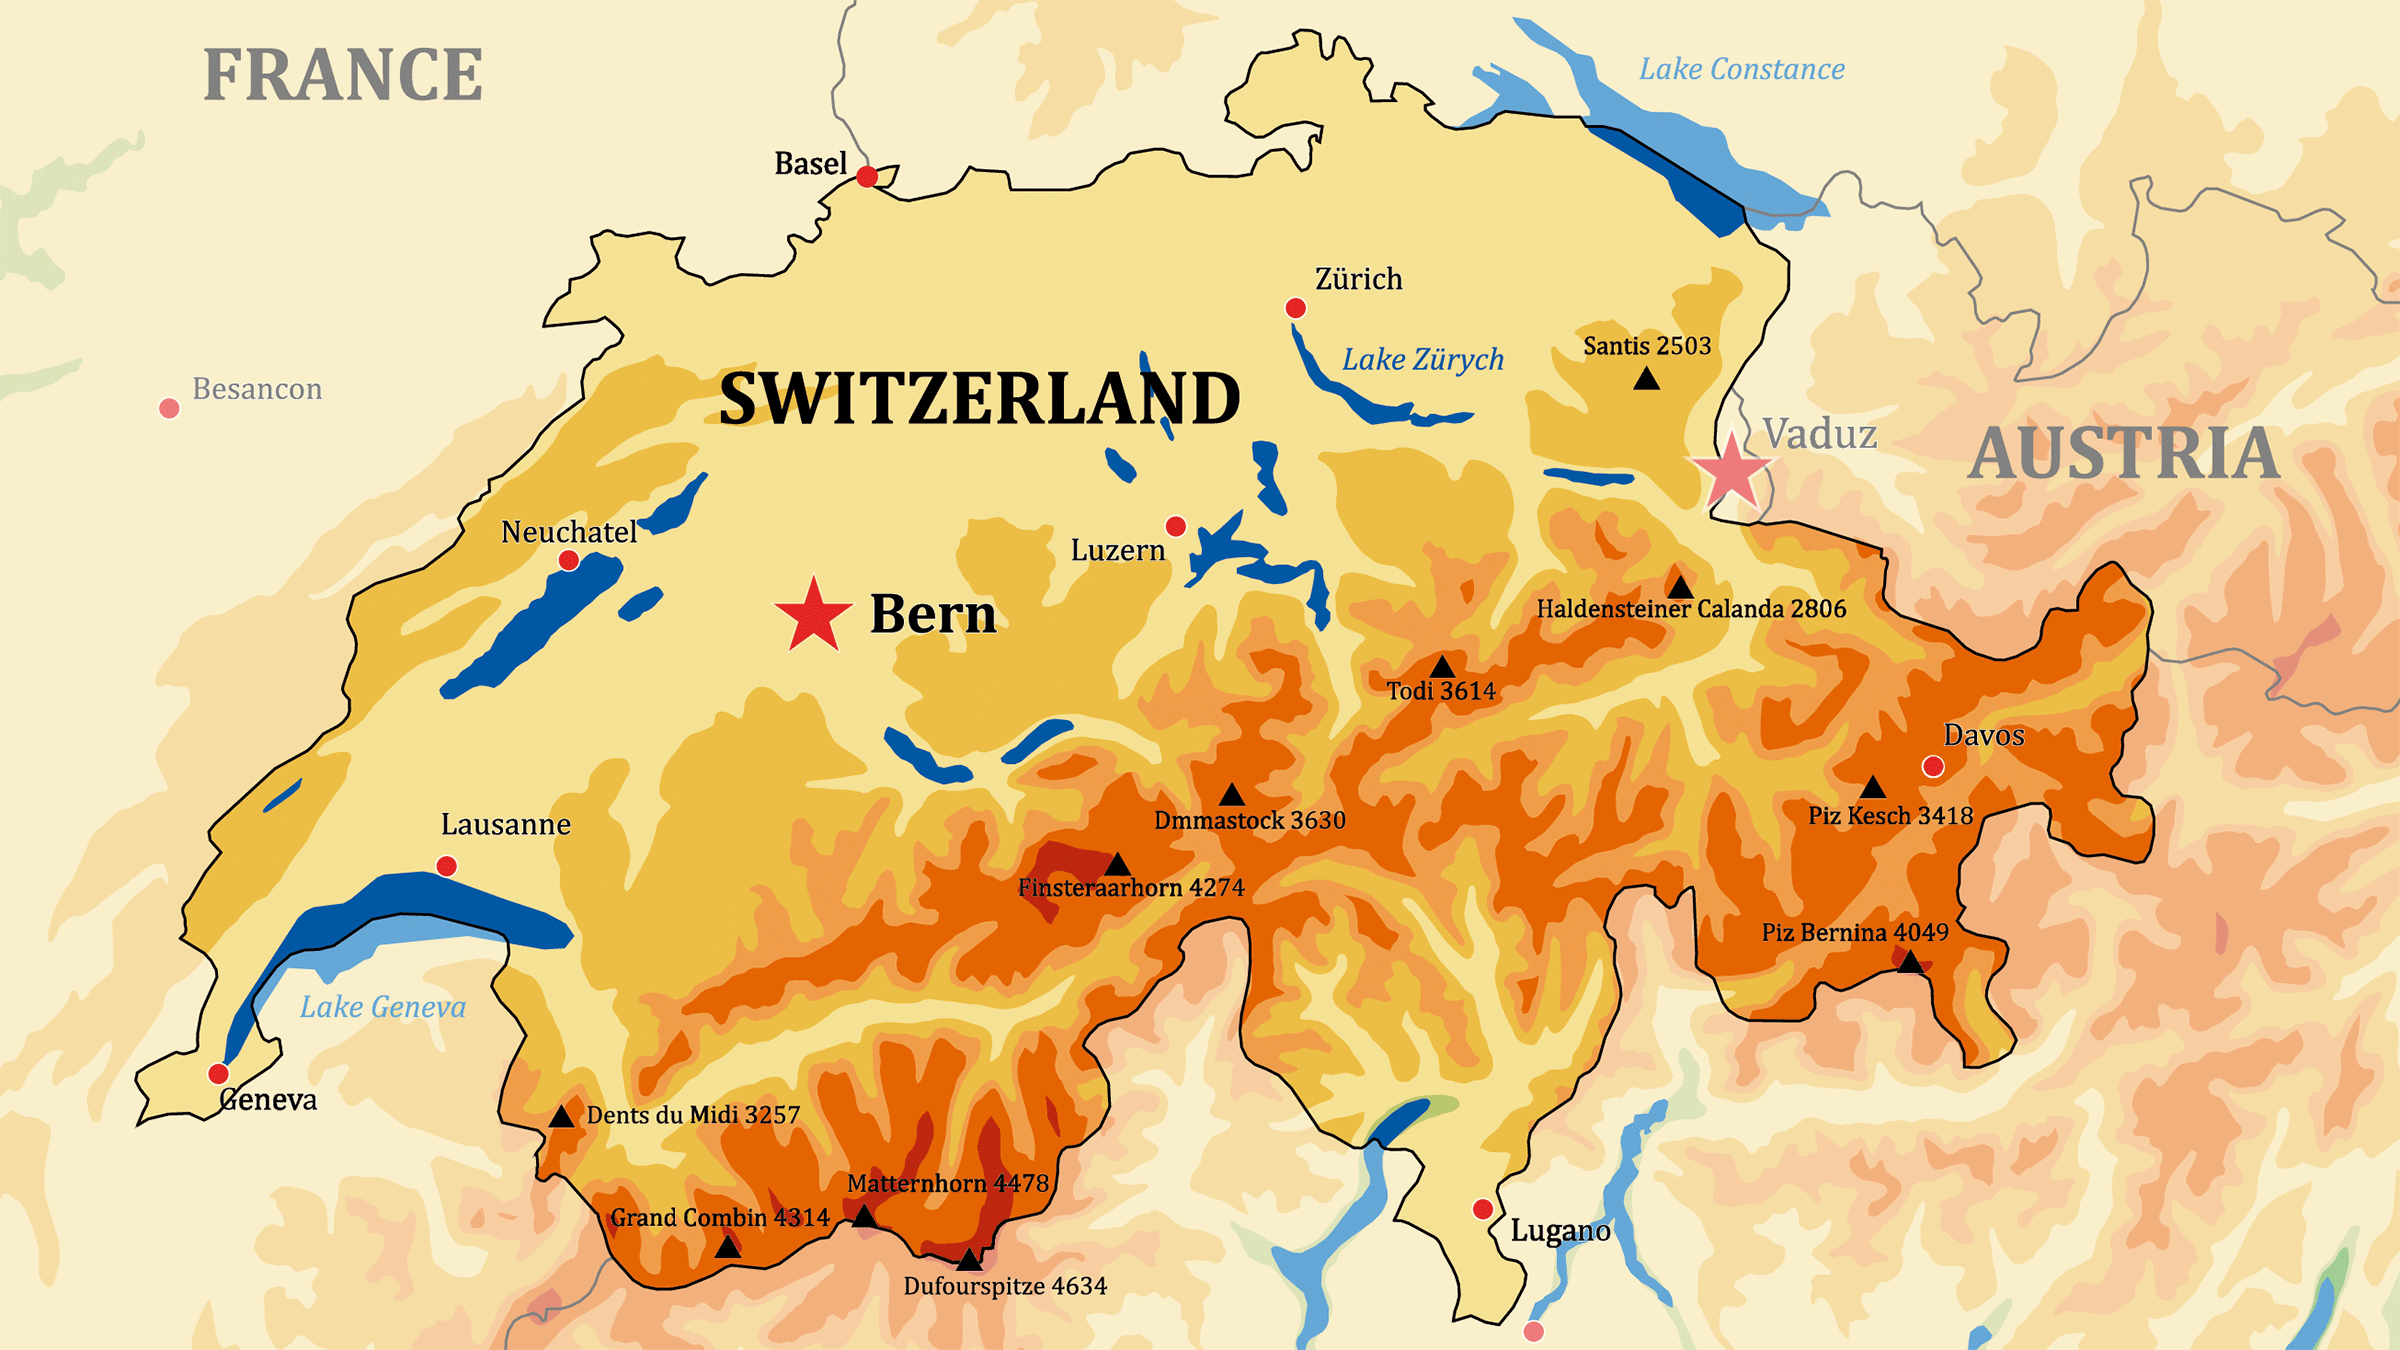 Mapa físico de Suiza